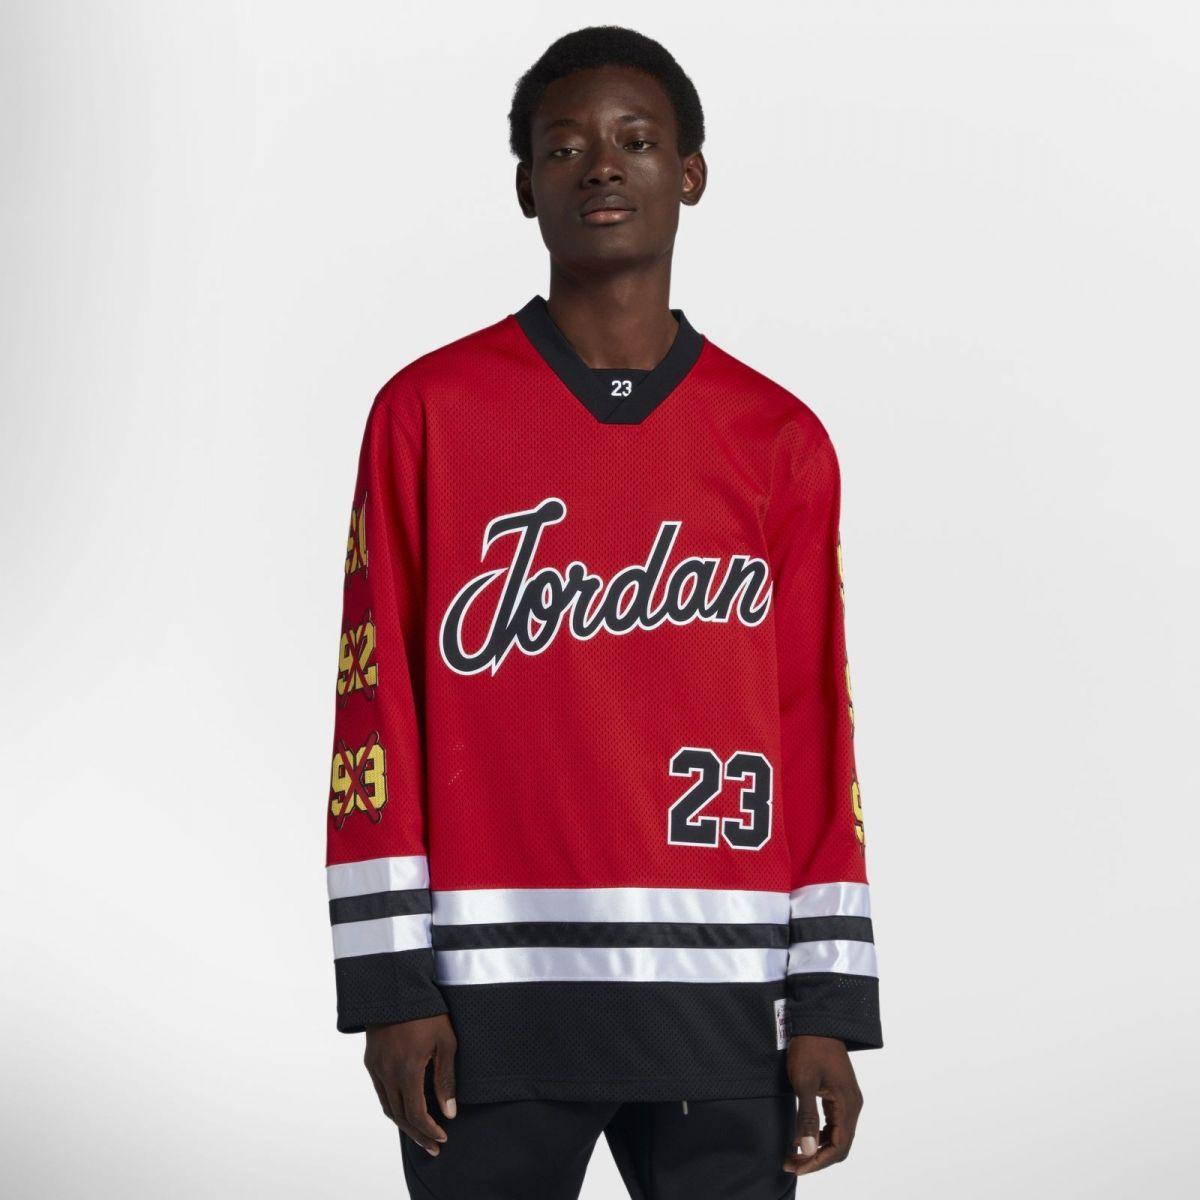 1710e3c45 Type Shirts Jordan Sportswear Hockey Jersey